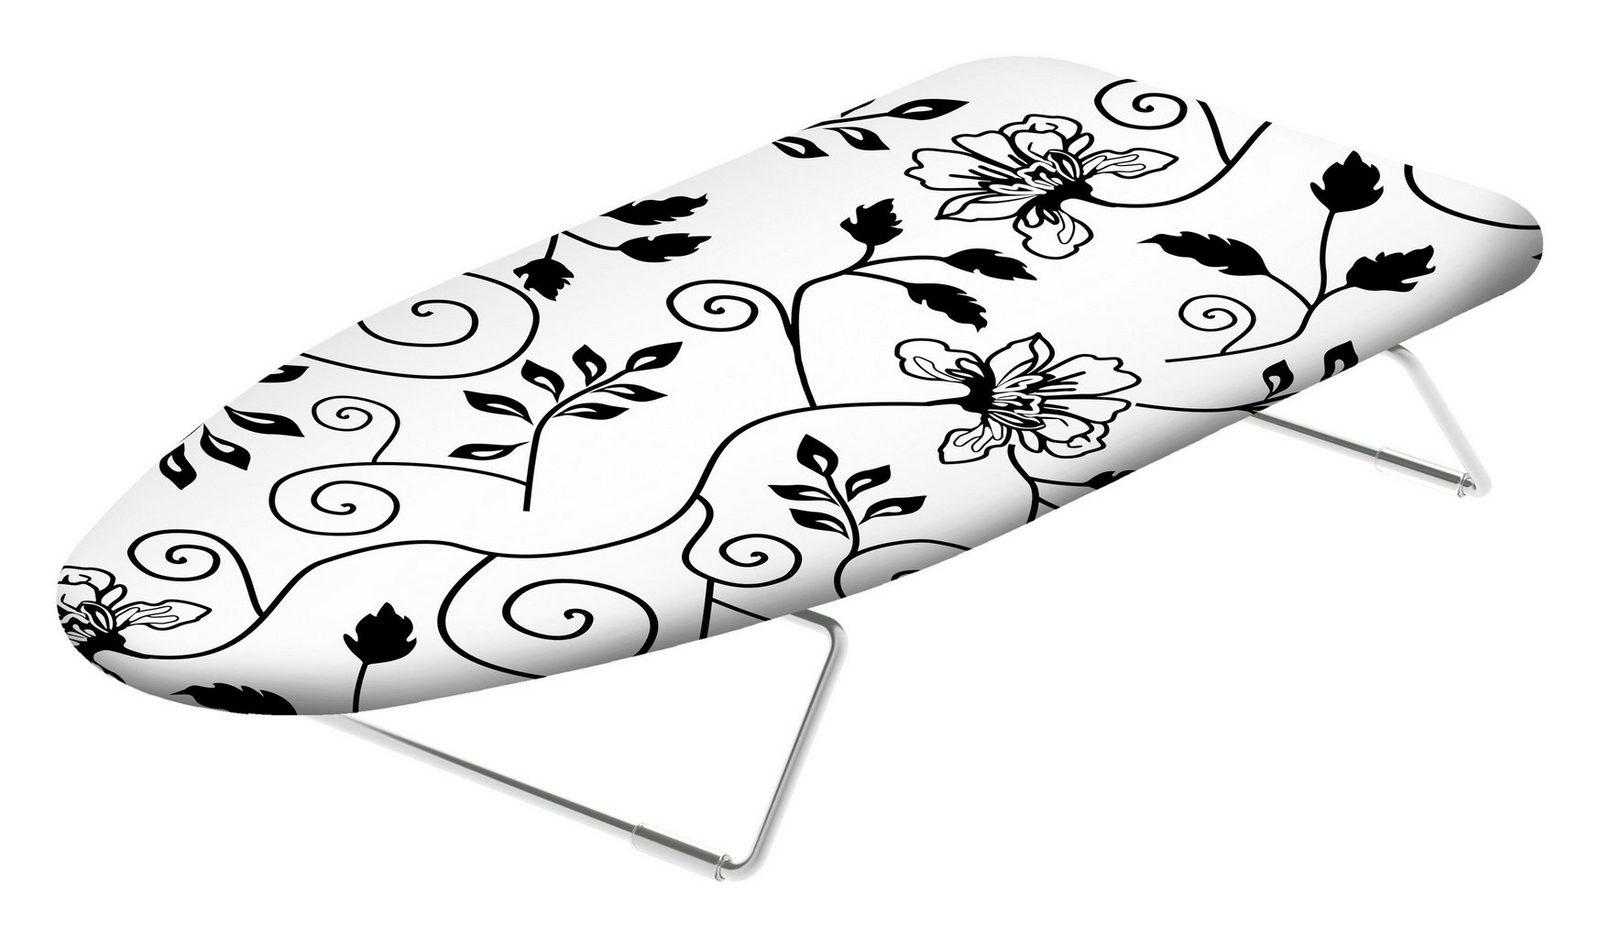 Colombo Newscal Tisch Bügelbrett »Miniasse«- 70 cm Breite jetztbilligerkaufen